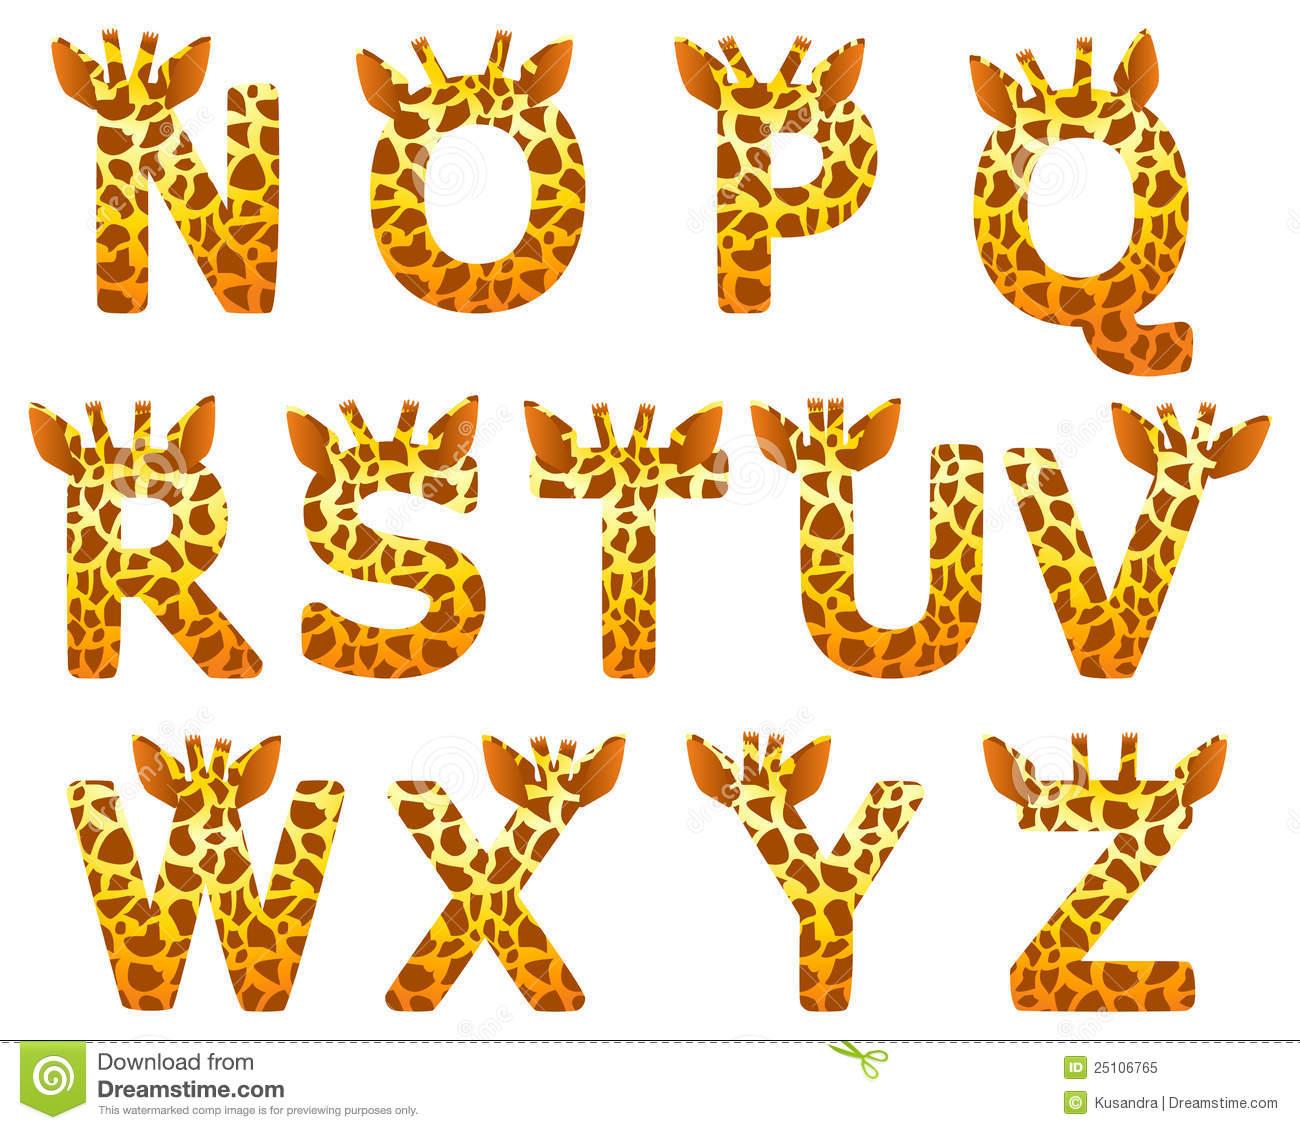 6 Animal Skin Font Letters Images